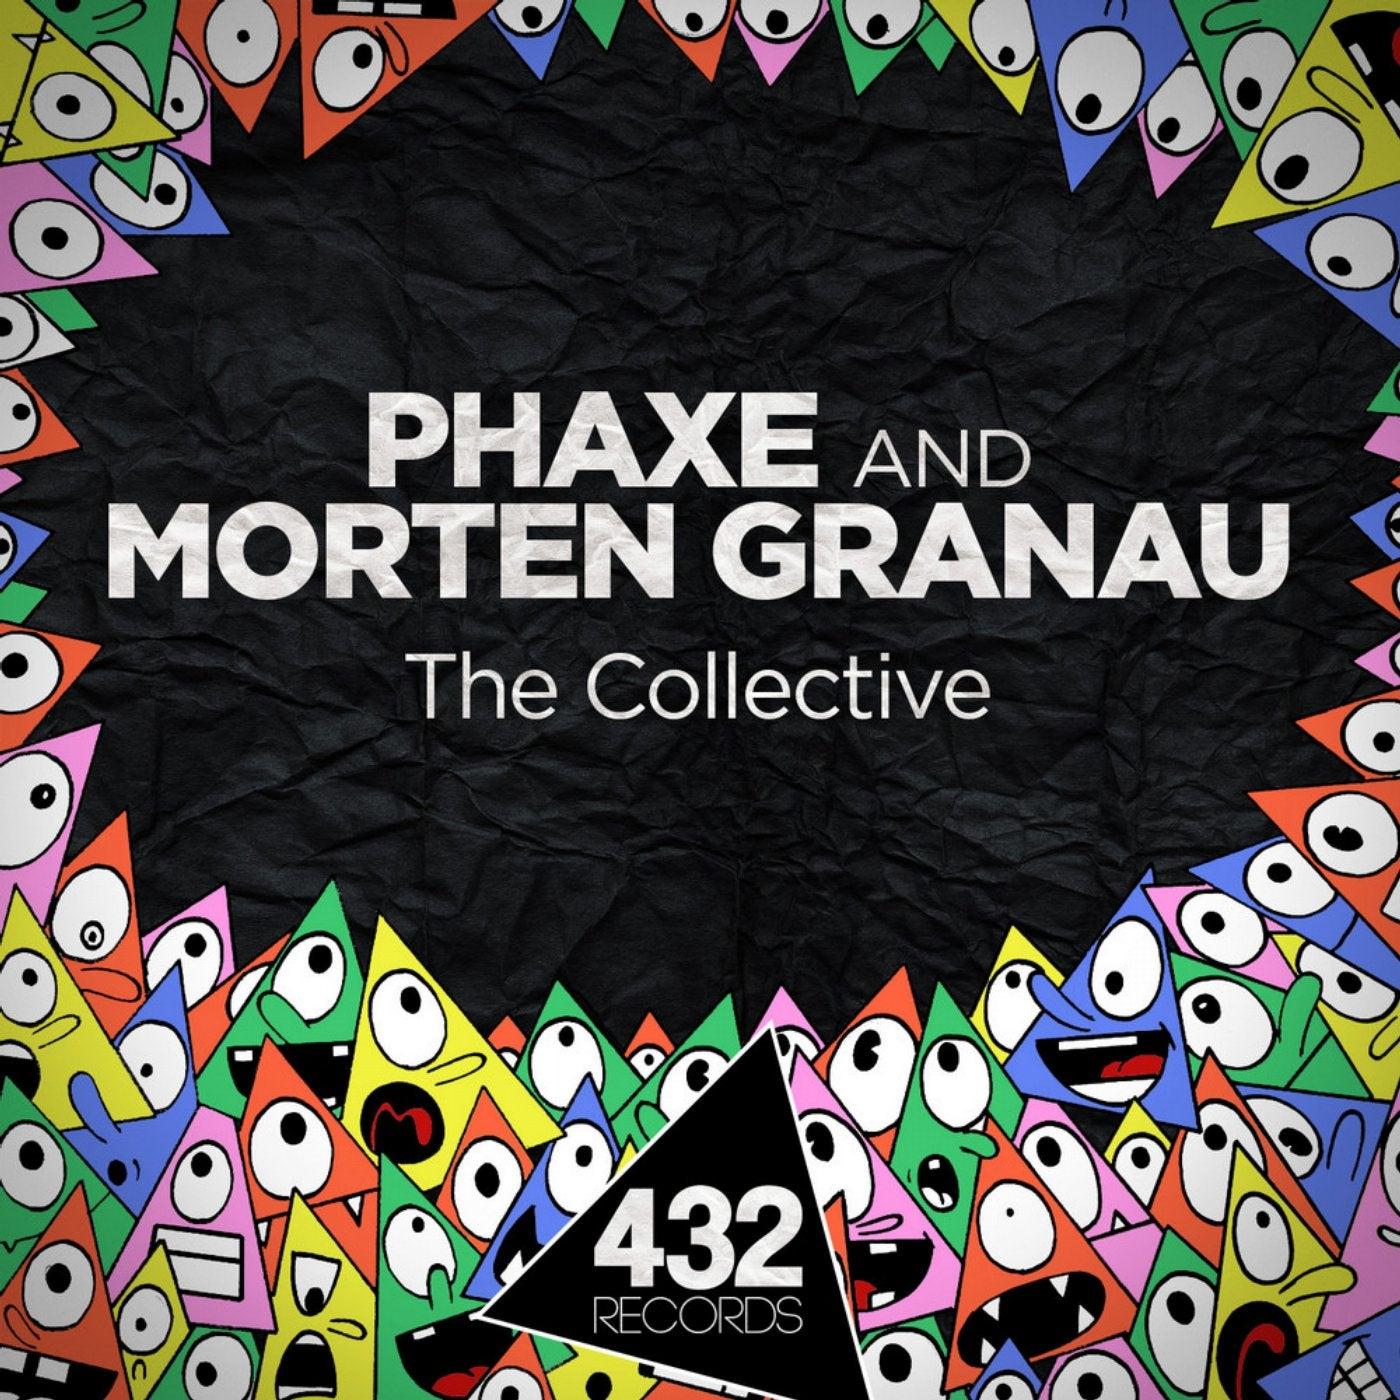 The Collective (Original Mix)